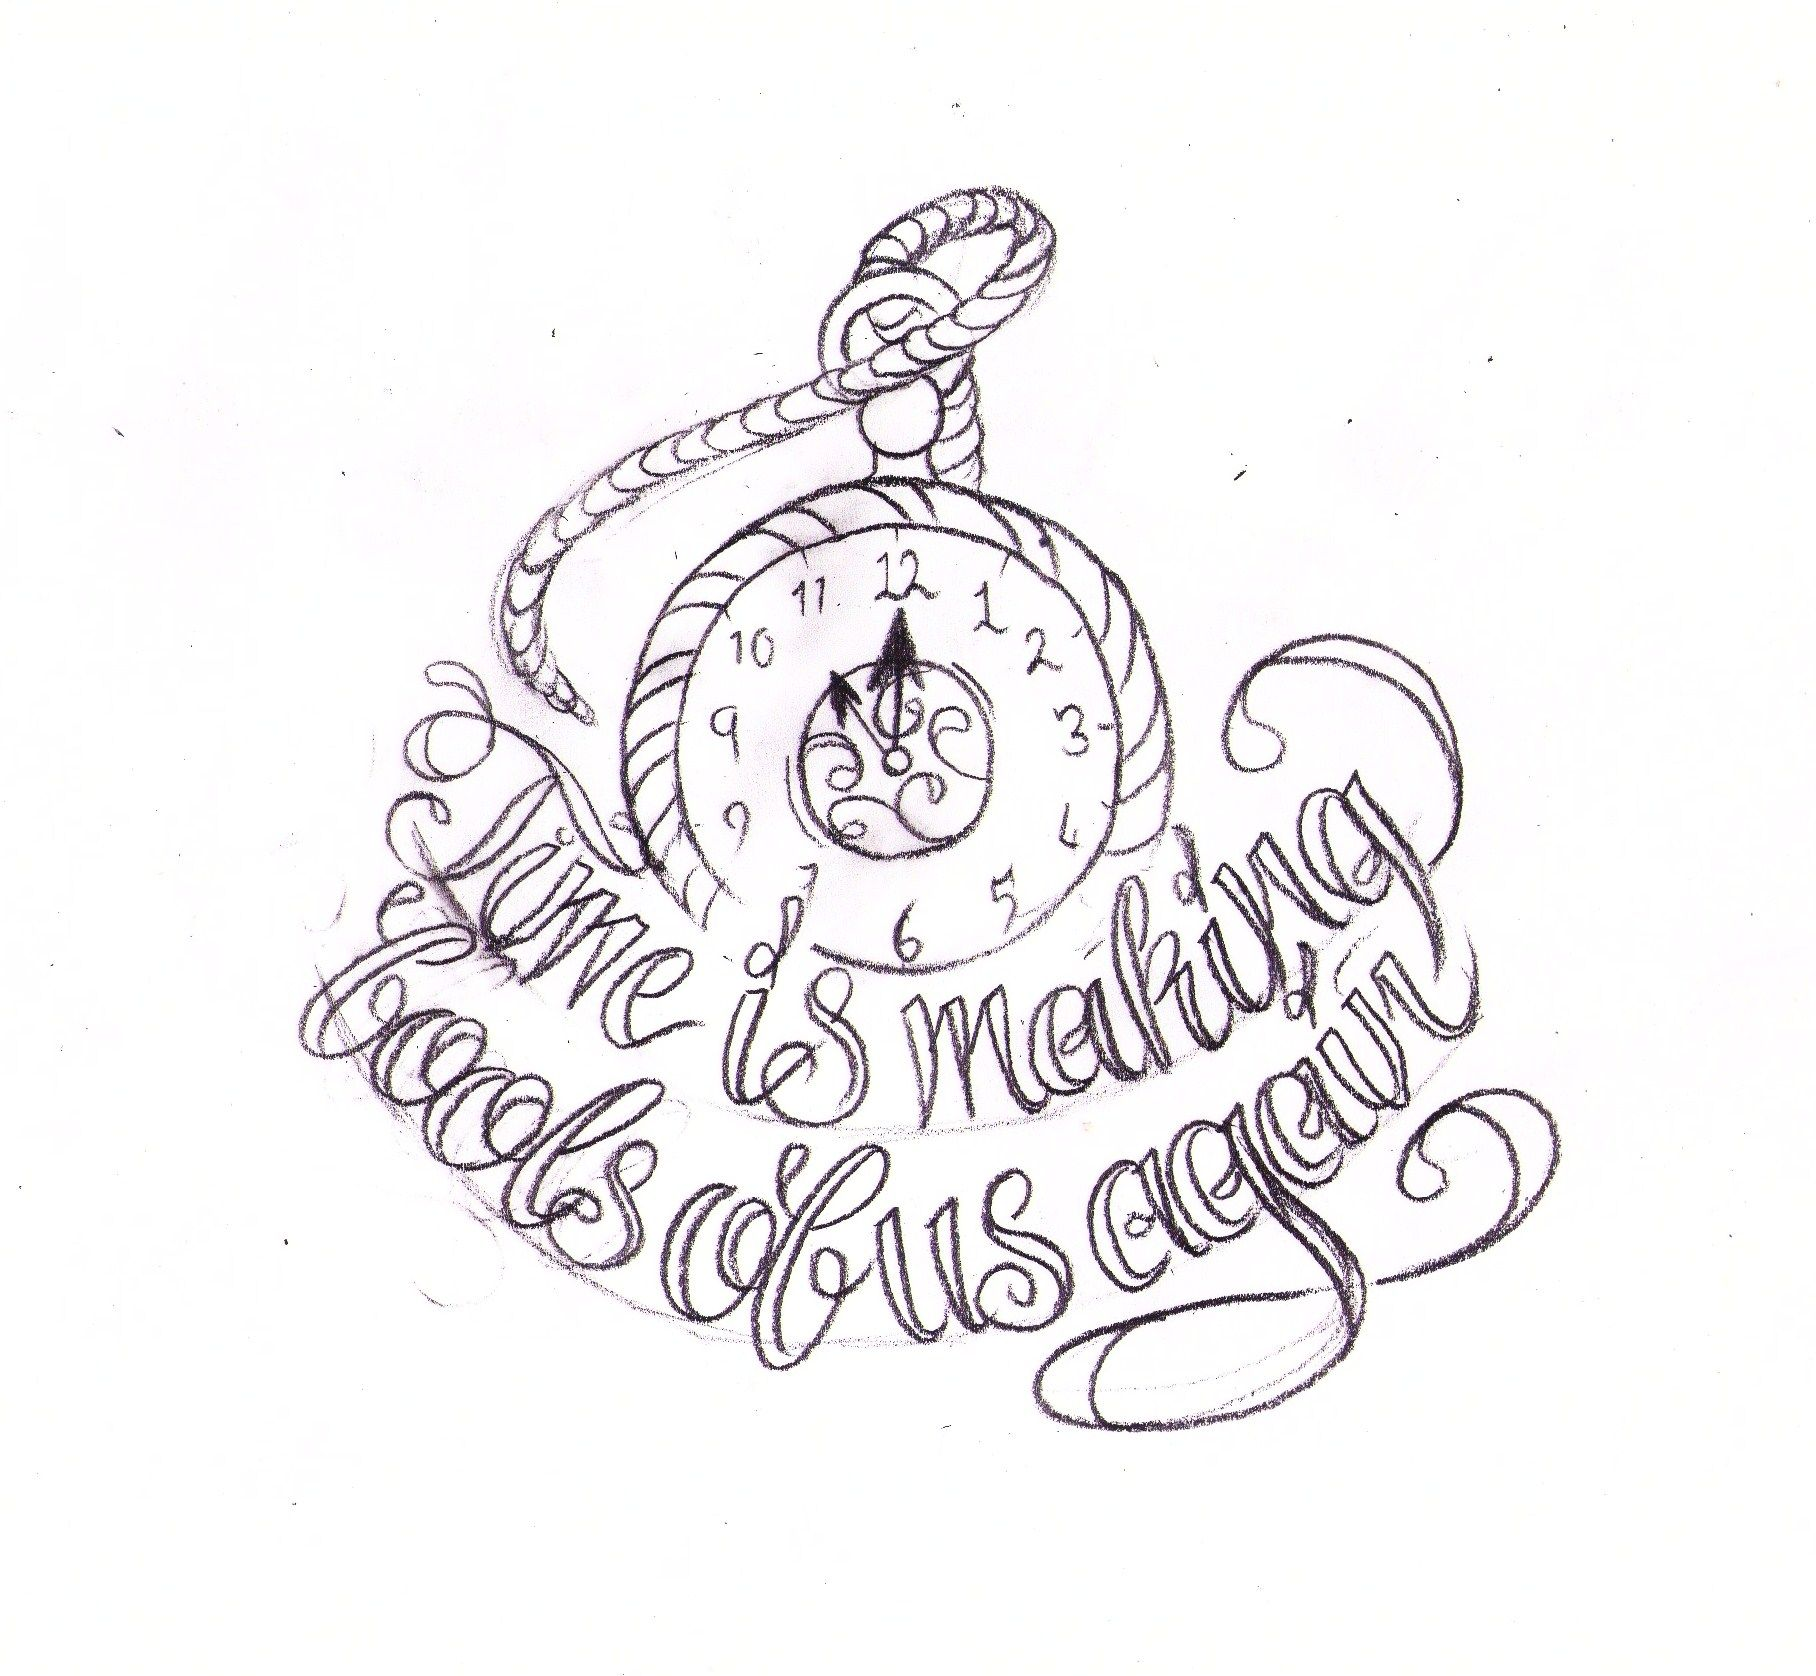 All About Art Tattoo Studio Rangiora Quality Work By Professional Artist Upstairs 5 Good Street Rangiora 03310 6669